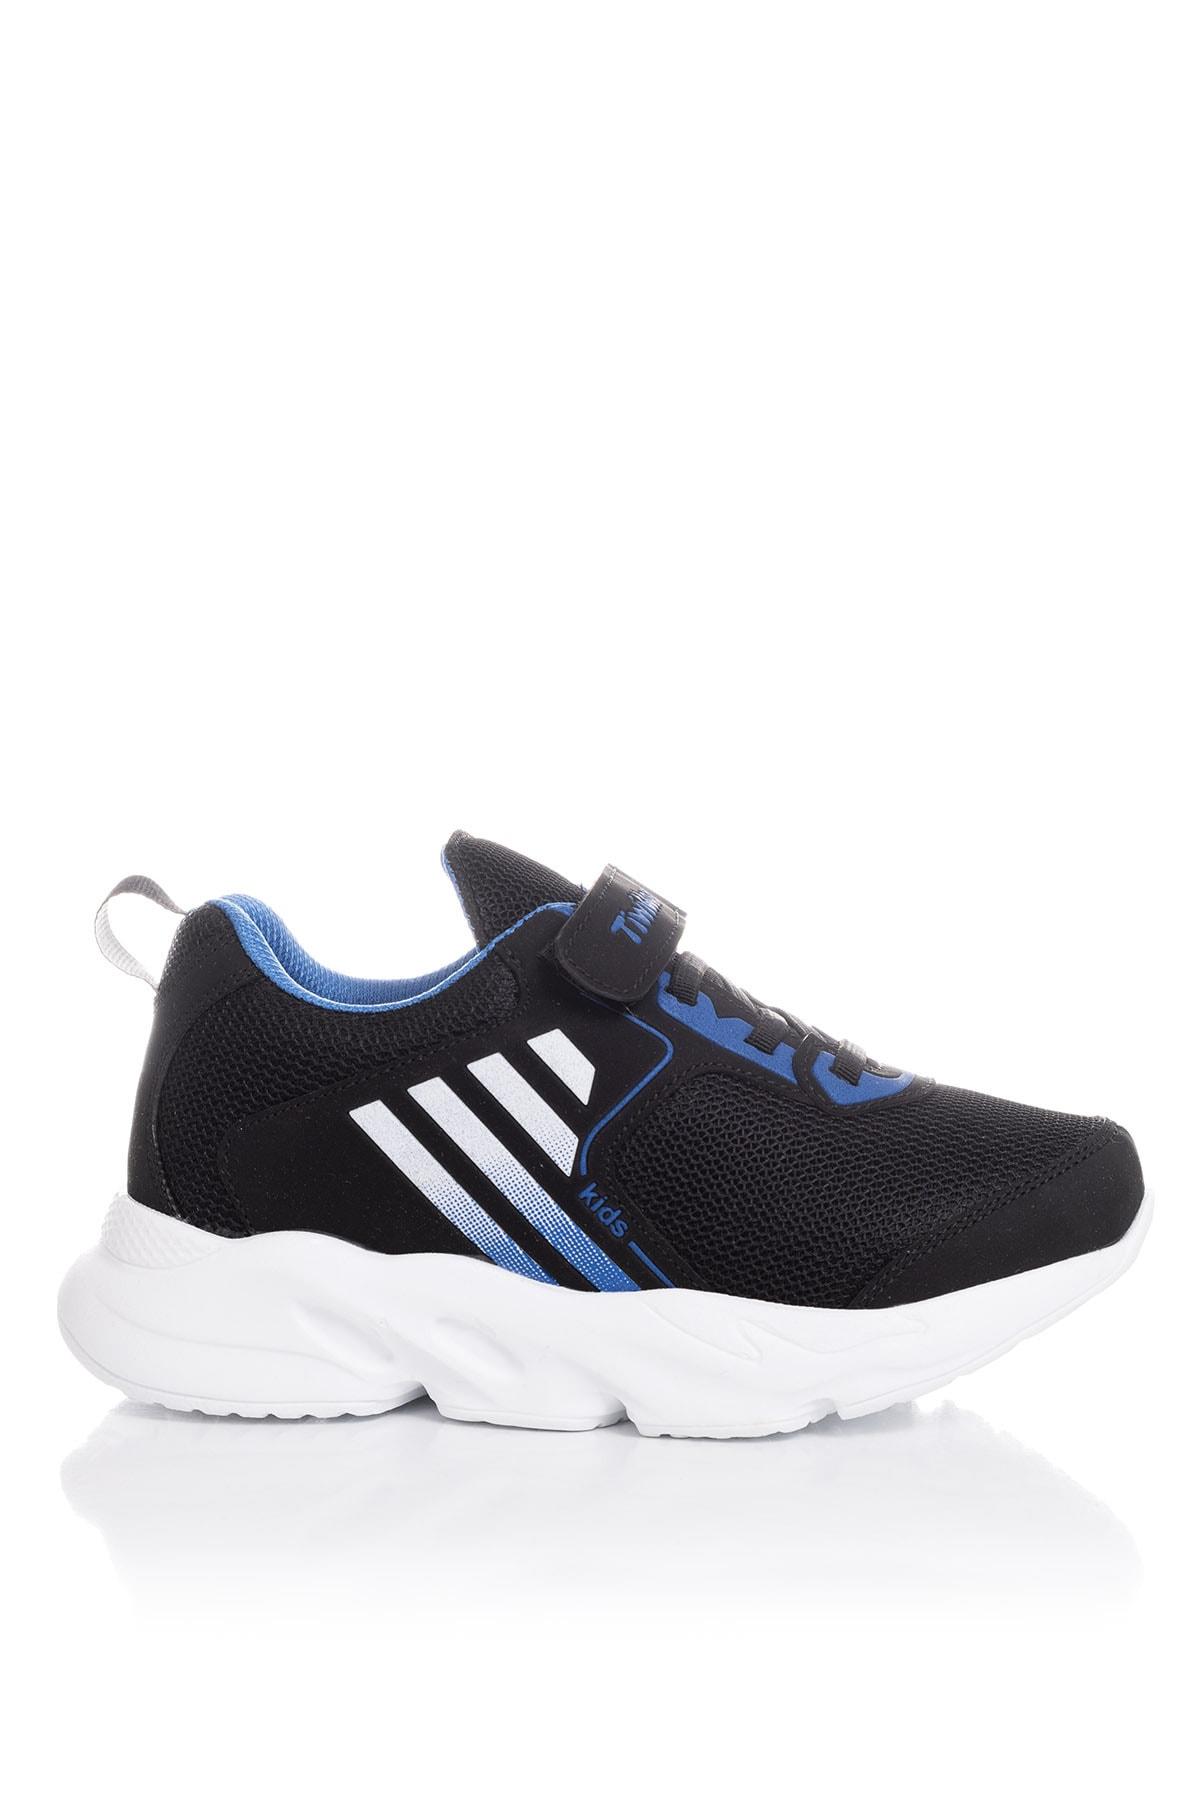 Tonny Black Siyah Sax Unisex Çocuk Sneaker TBZ05-3 2